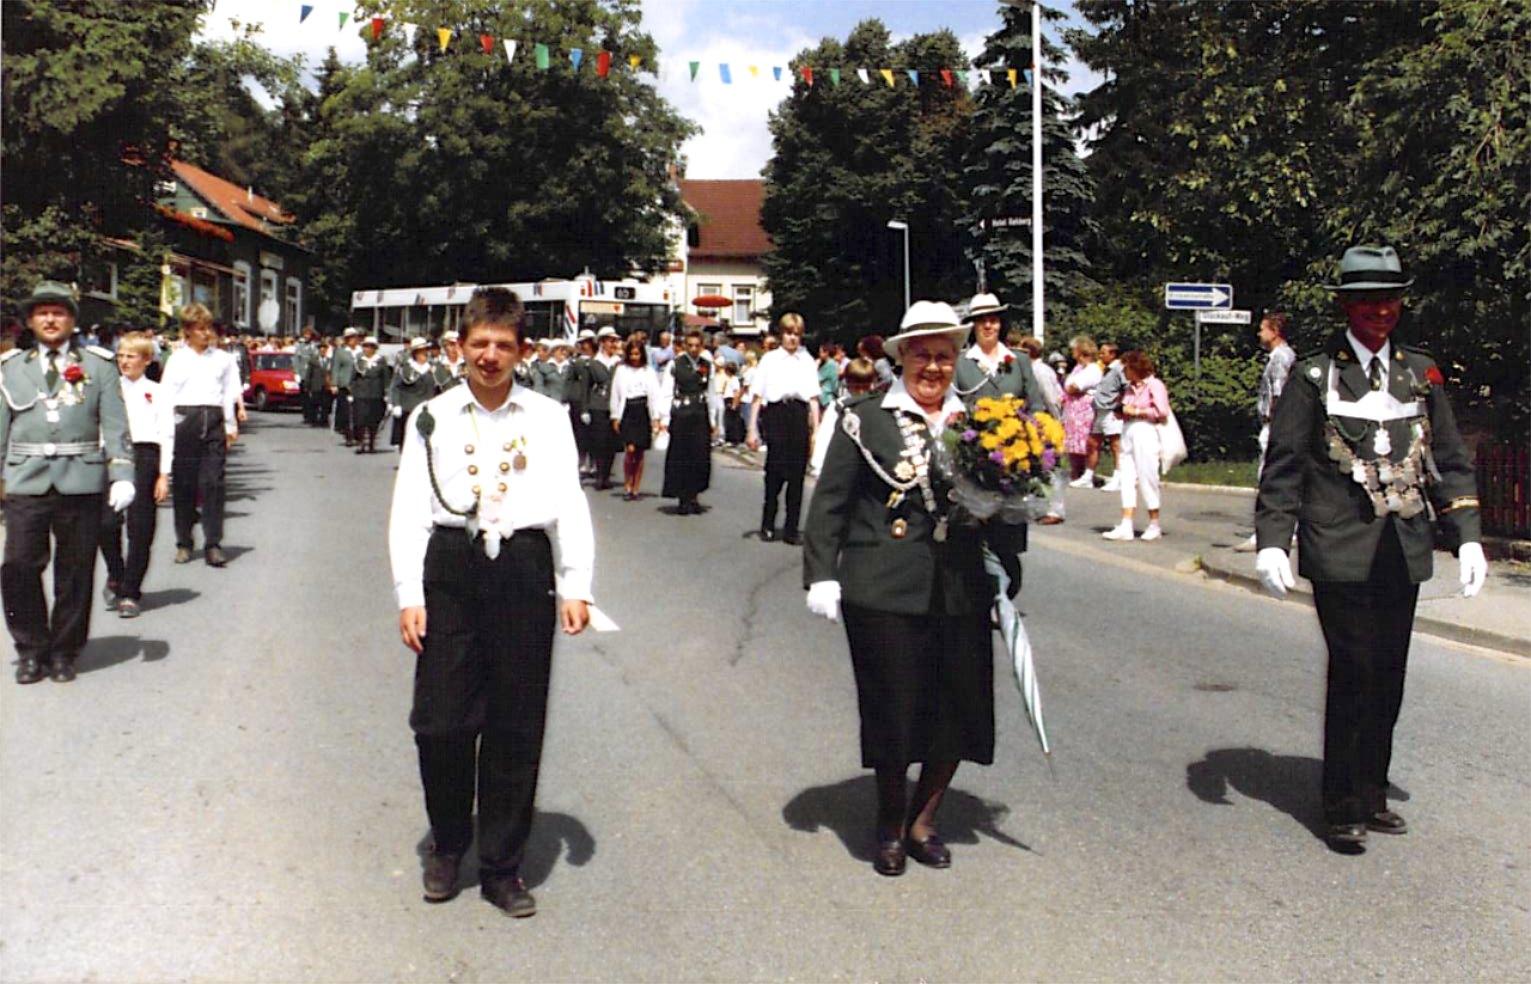 Schützenkönige 1991